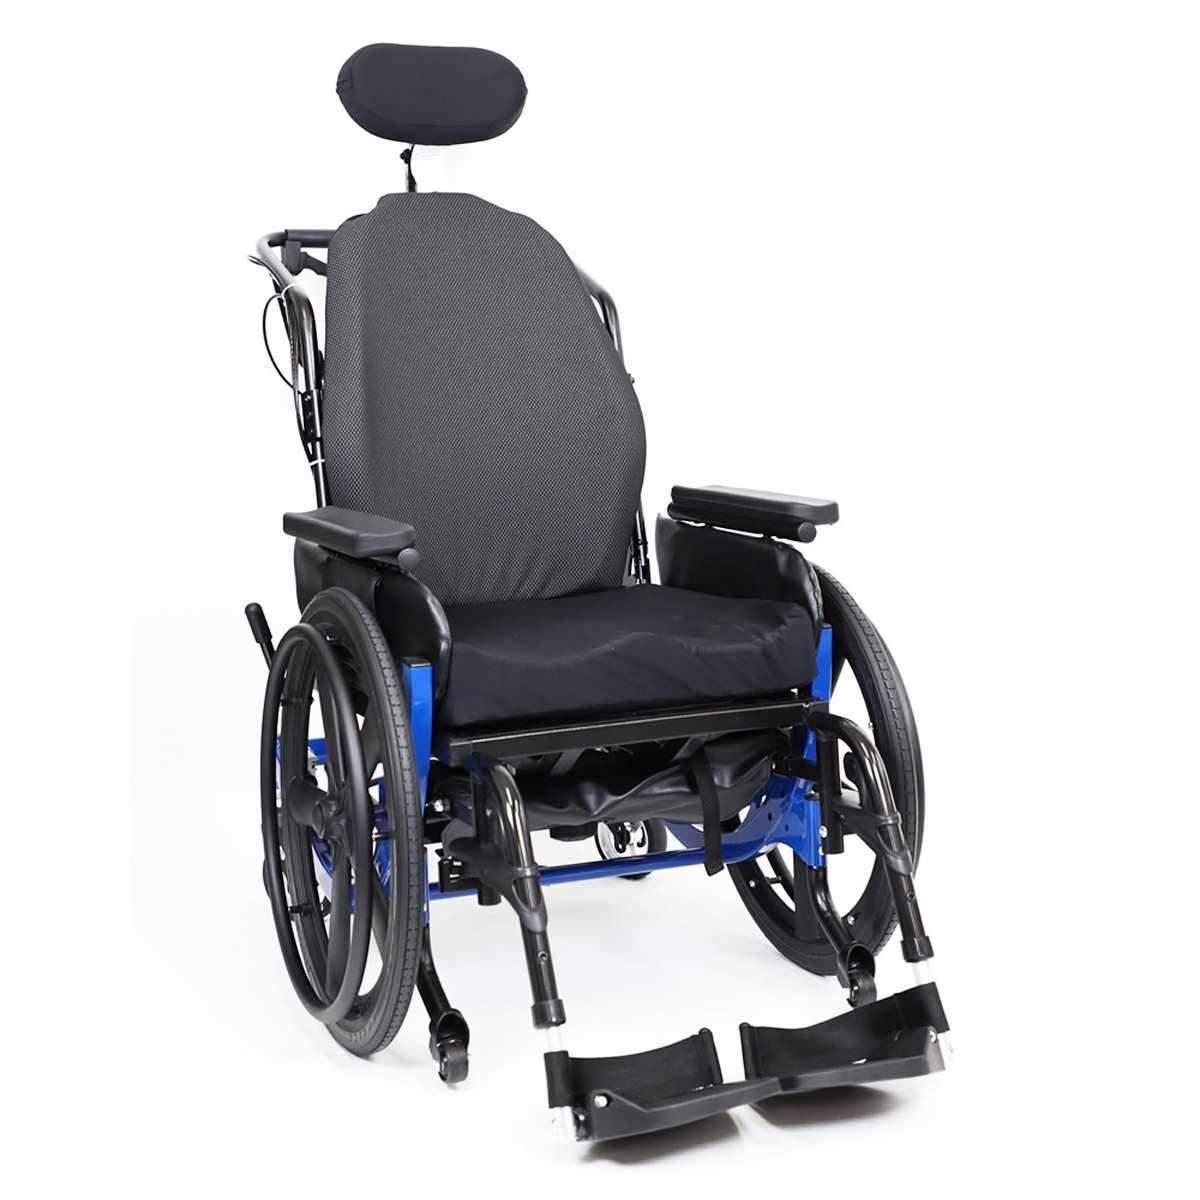 Encore Rehab Wheelchair by Broda Seating